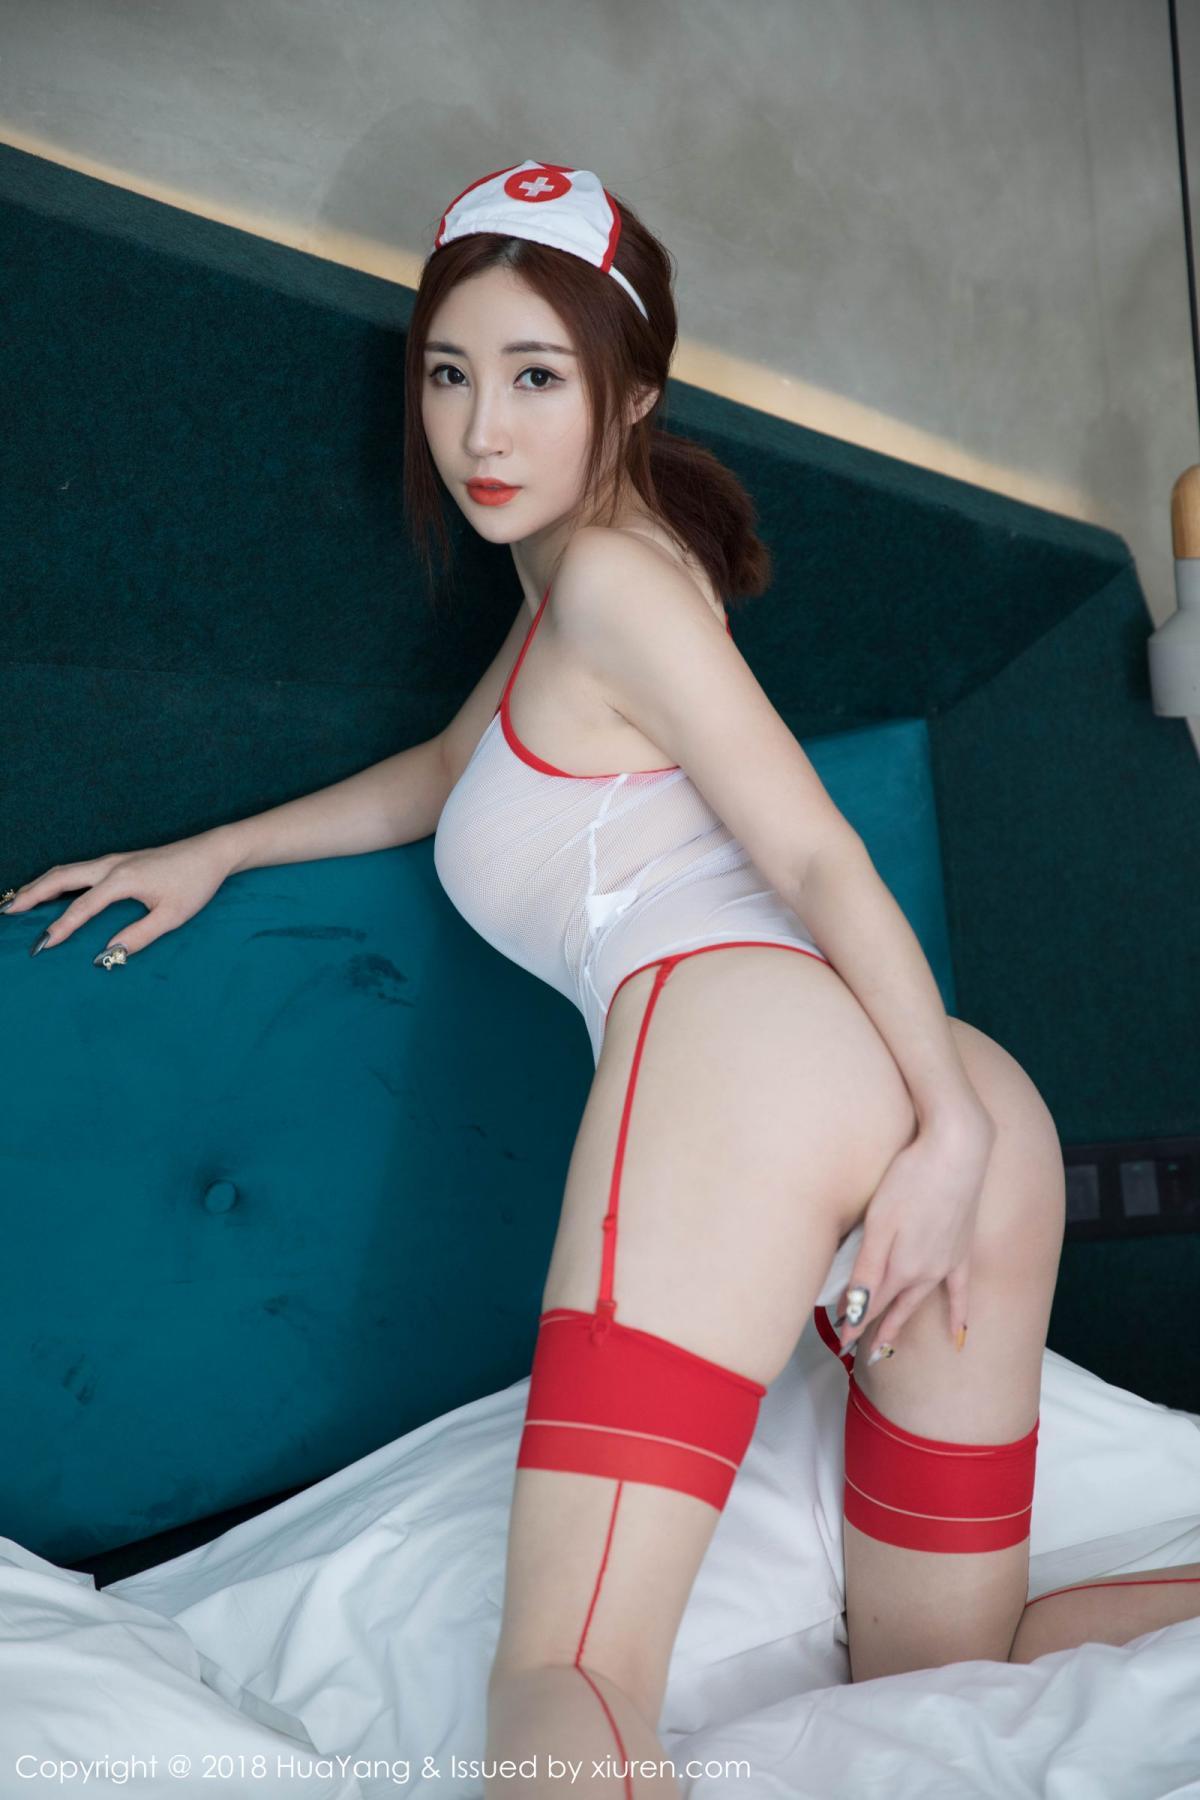 [Huayang] Vol.092 Sun Meng Yao 19P, HuaYang, Nurse, Sun Meng Yao, Tall, Uniform